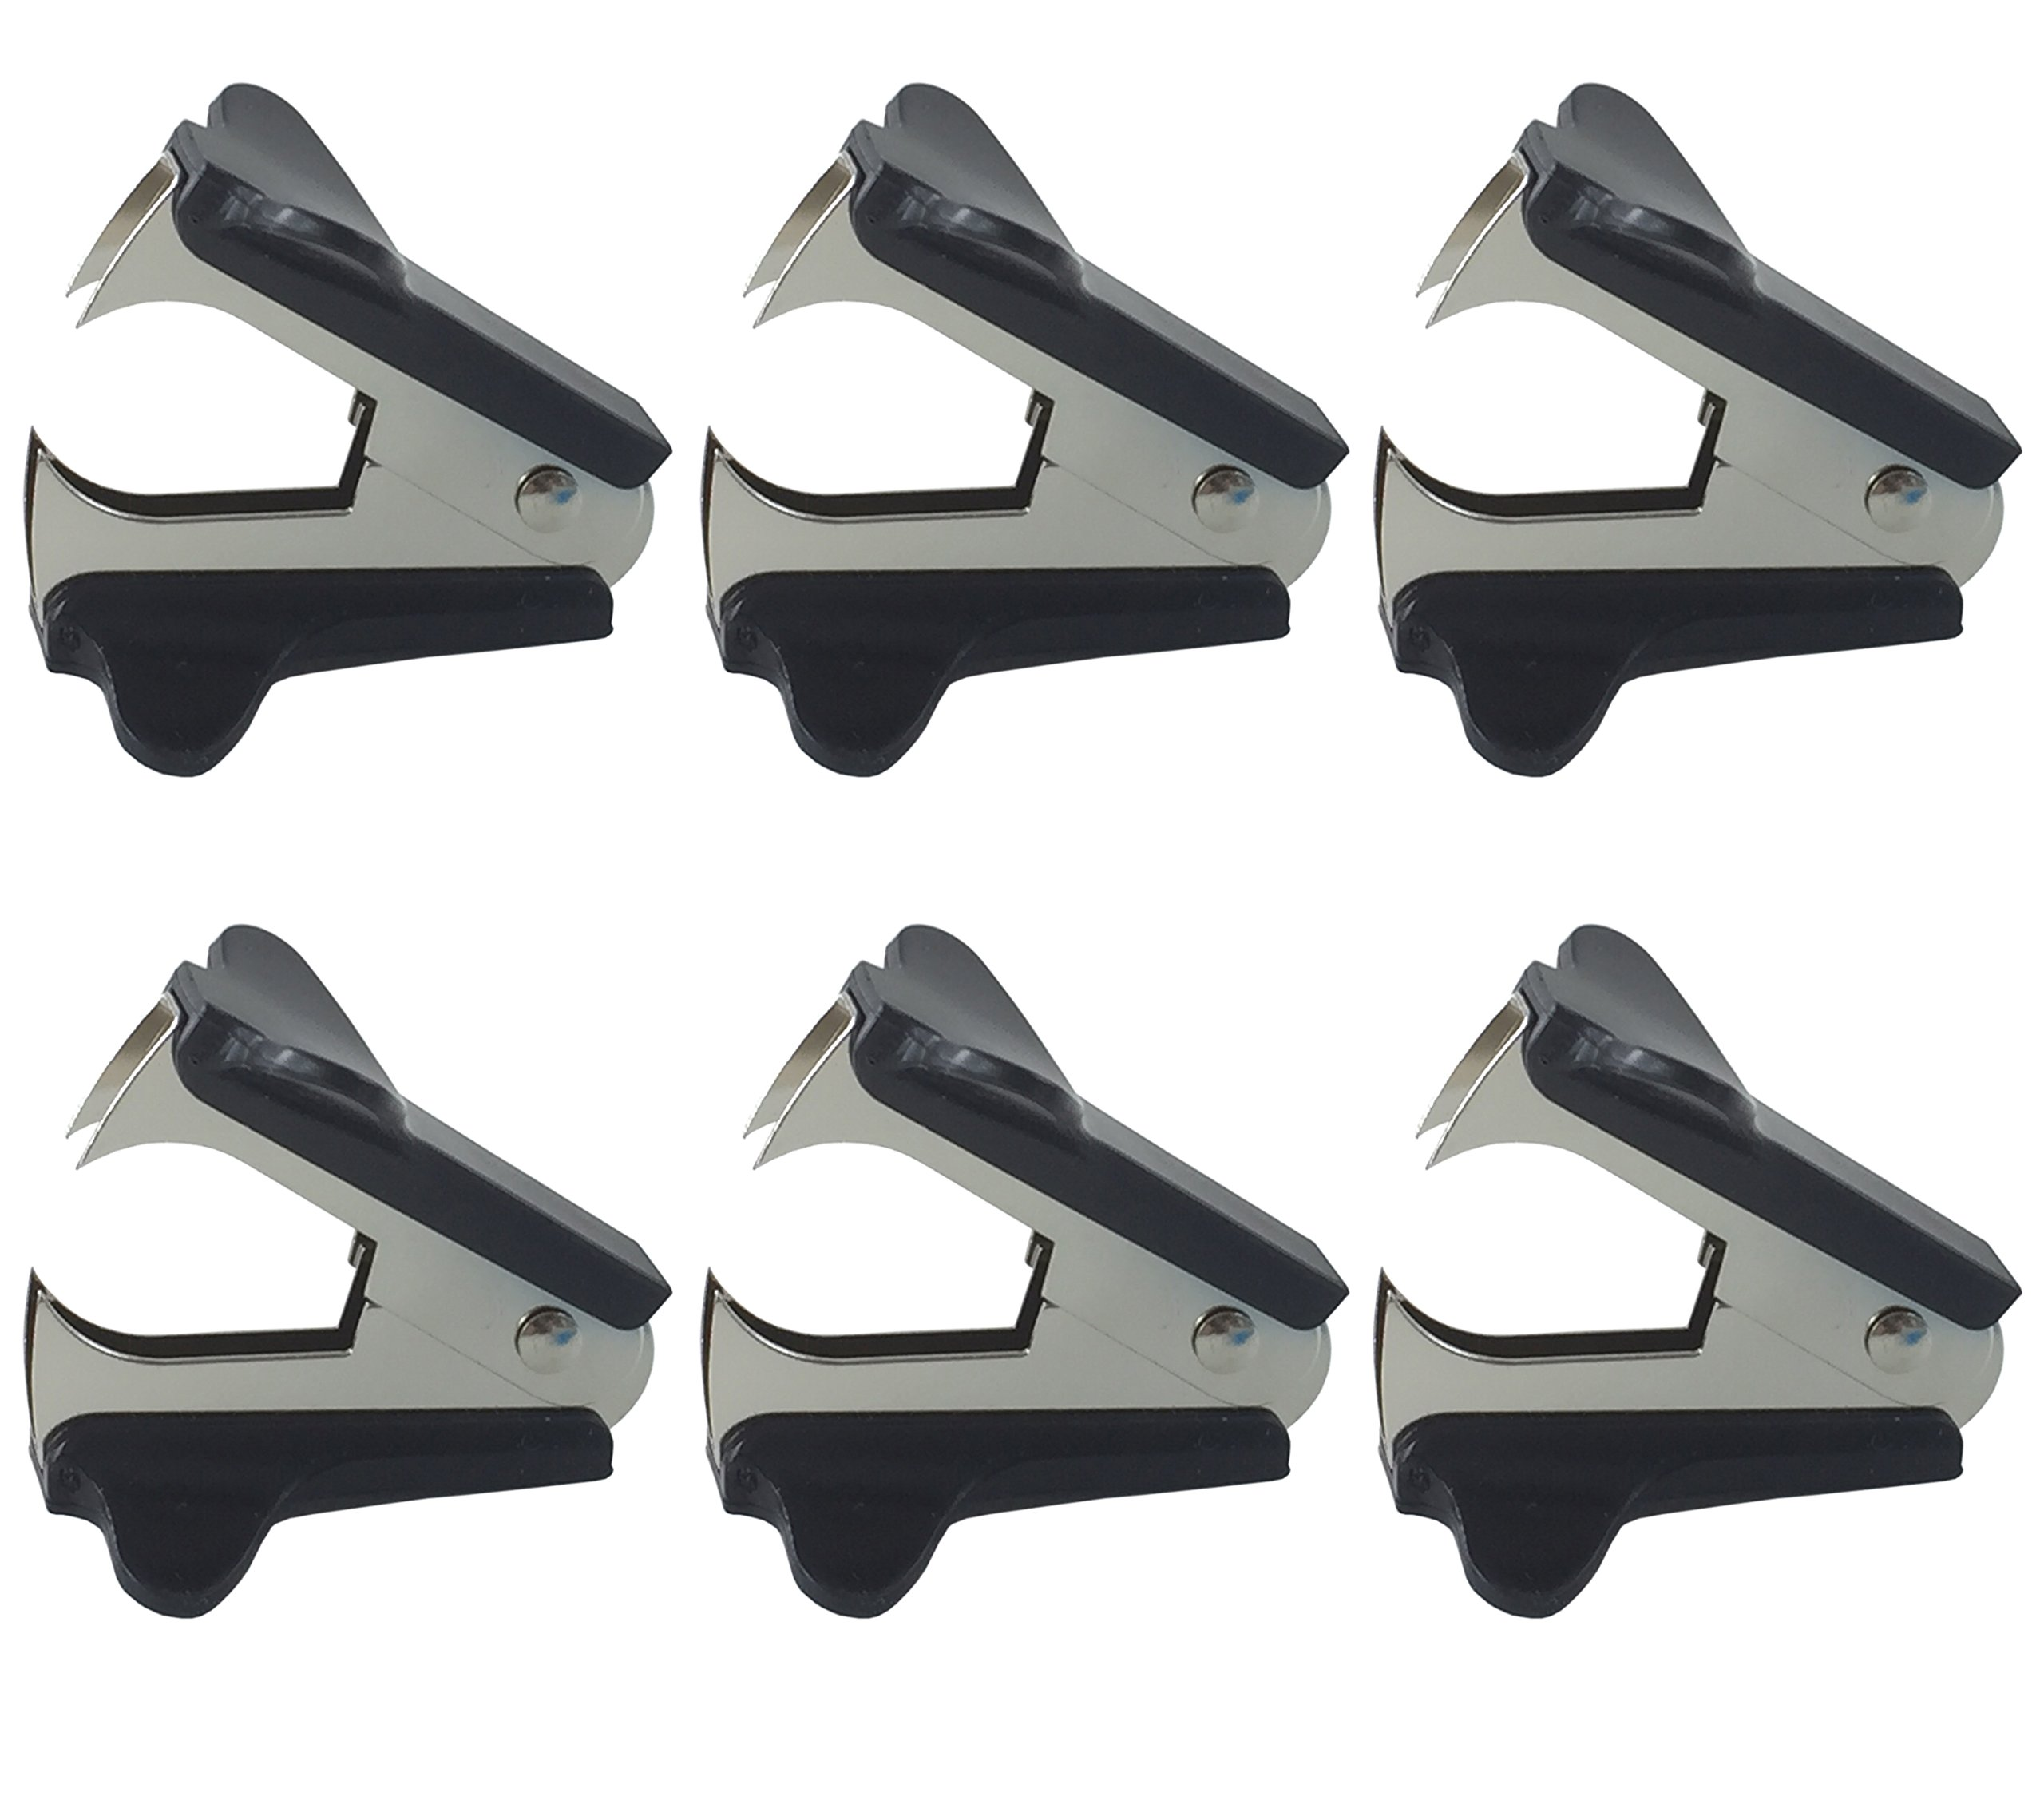 Clipco Staple Remover 6 Pack Black